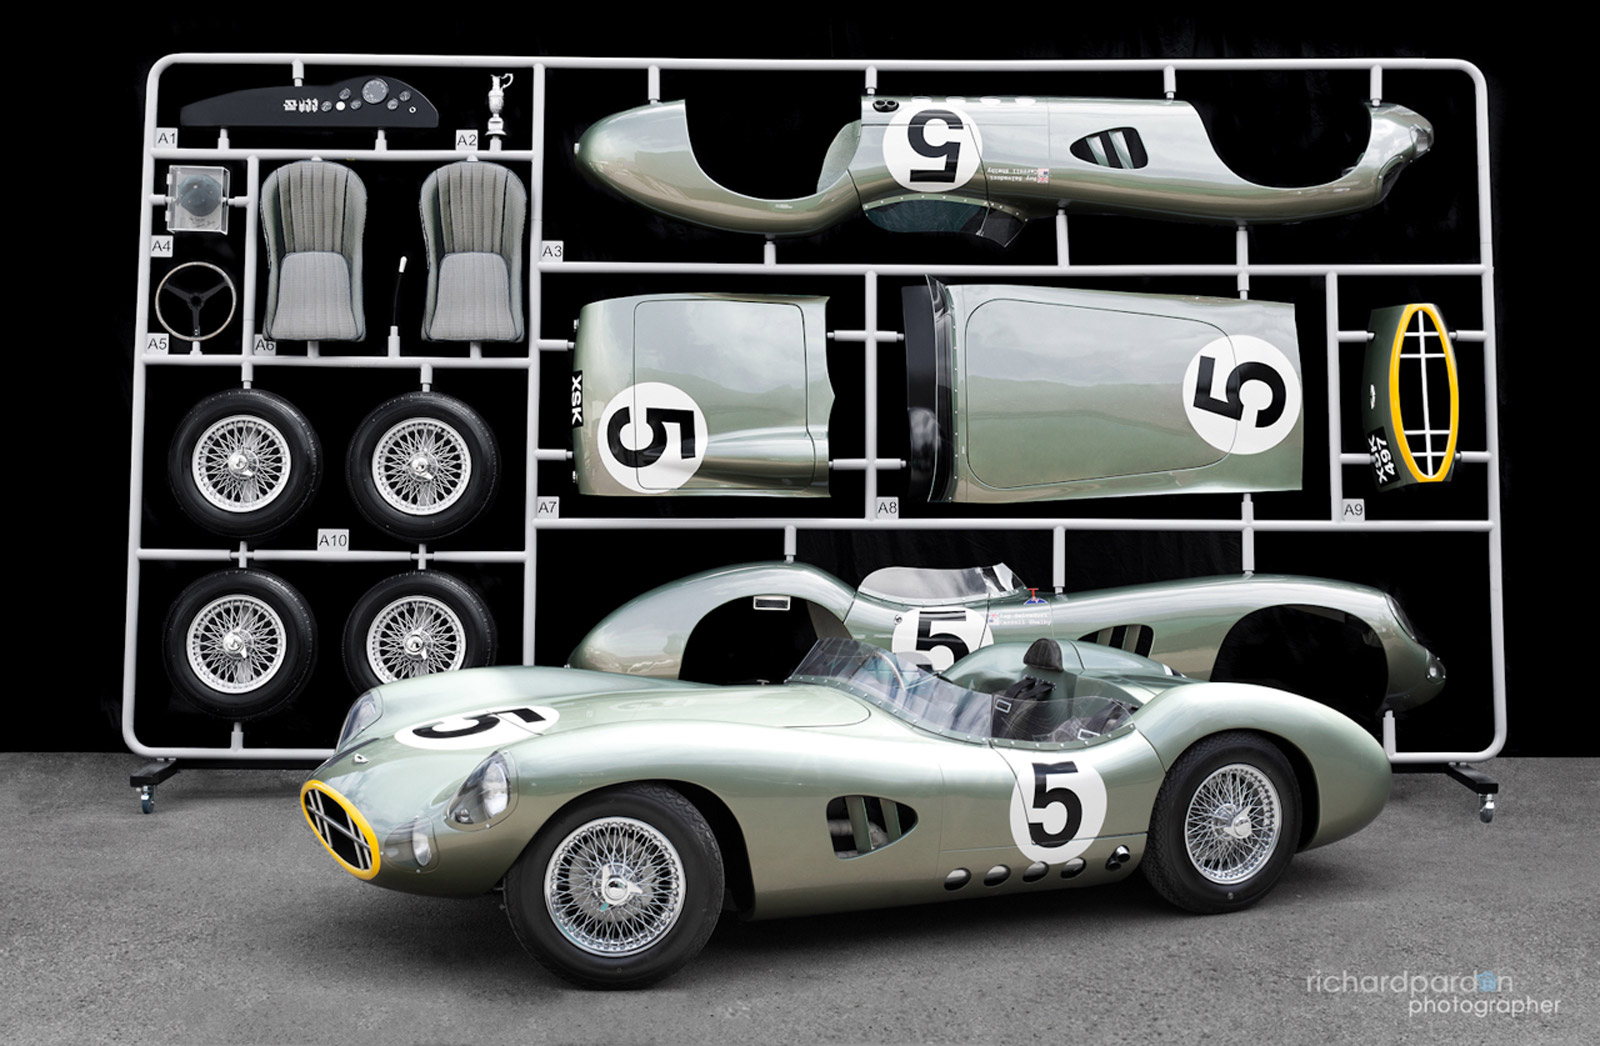 Le Mans Winning Aston Martin Dbr1 Imagined As Life Sized Model